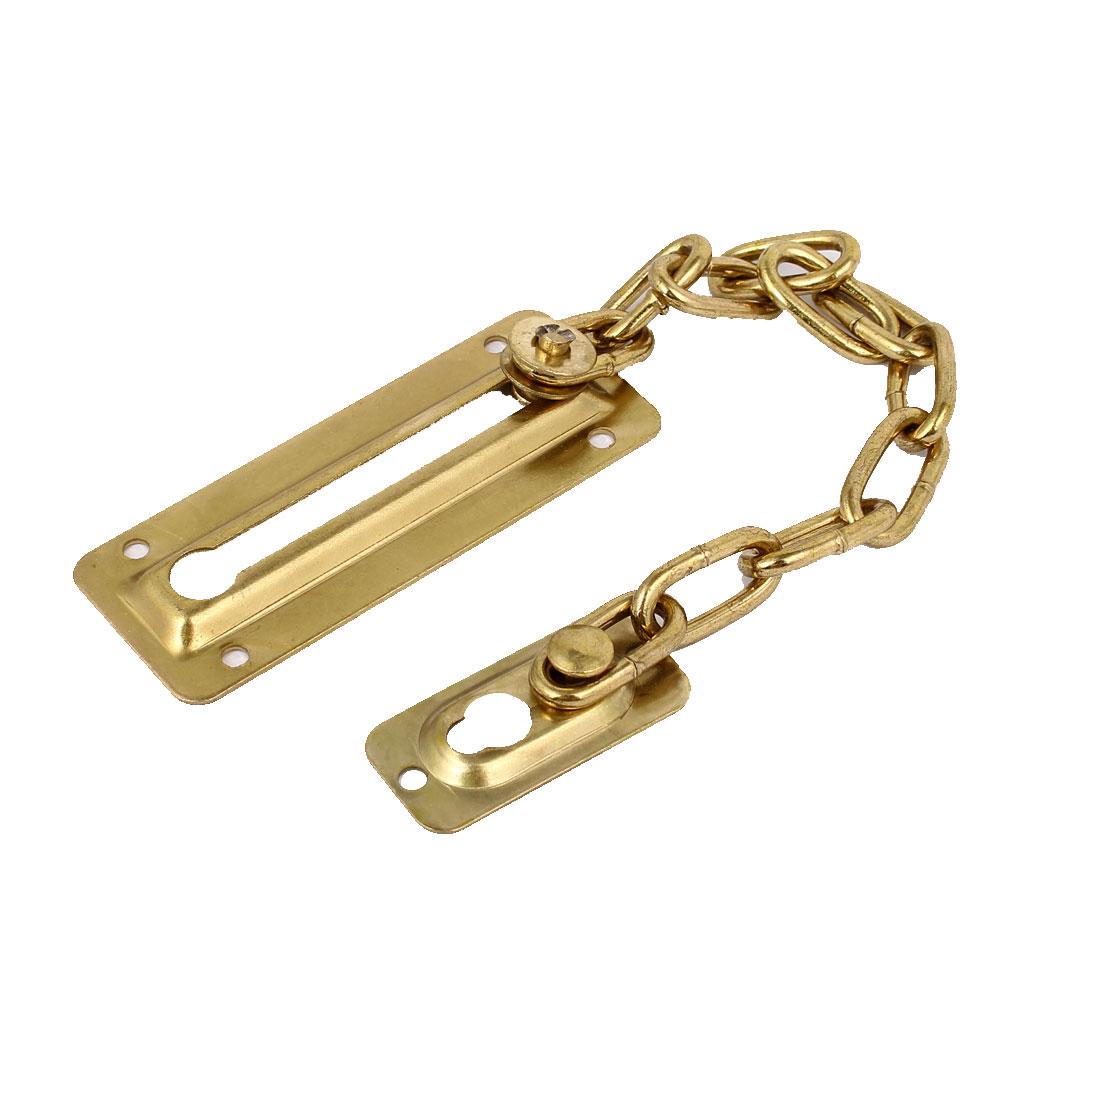 Home Office Door Metal Security Chain Guard  Bolt Lock Brass Tone